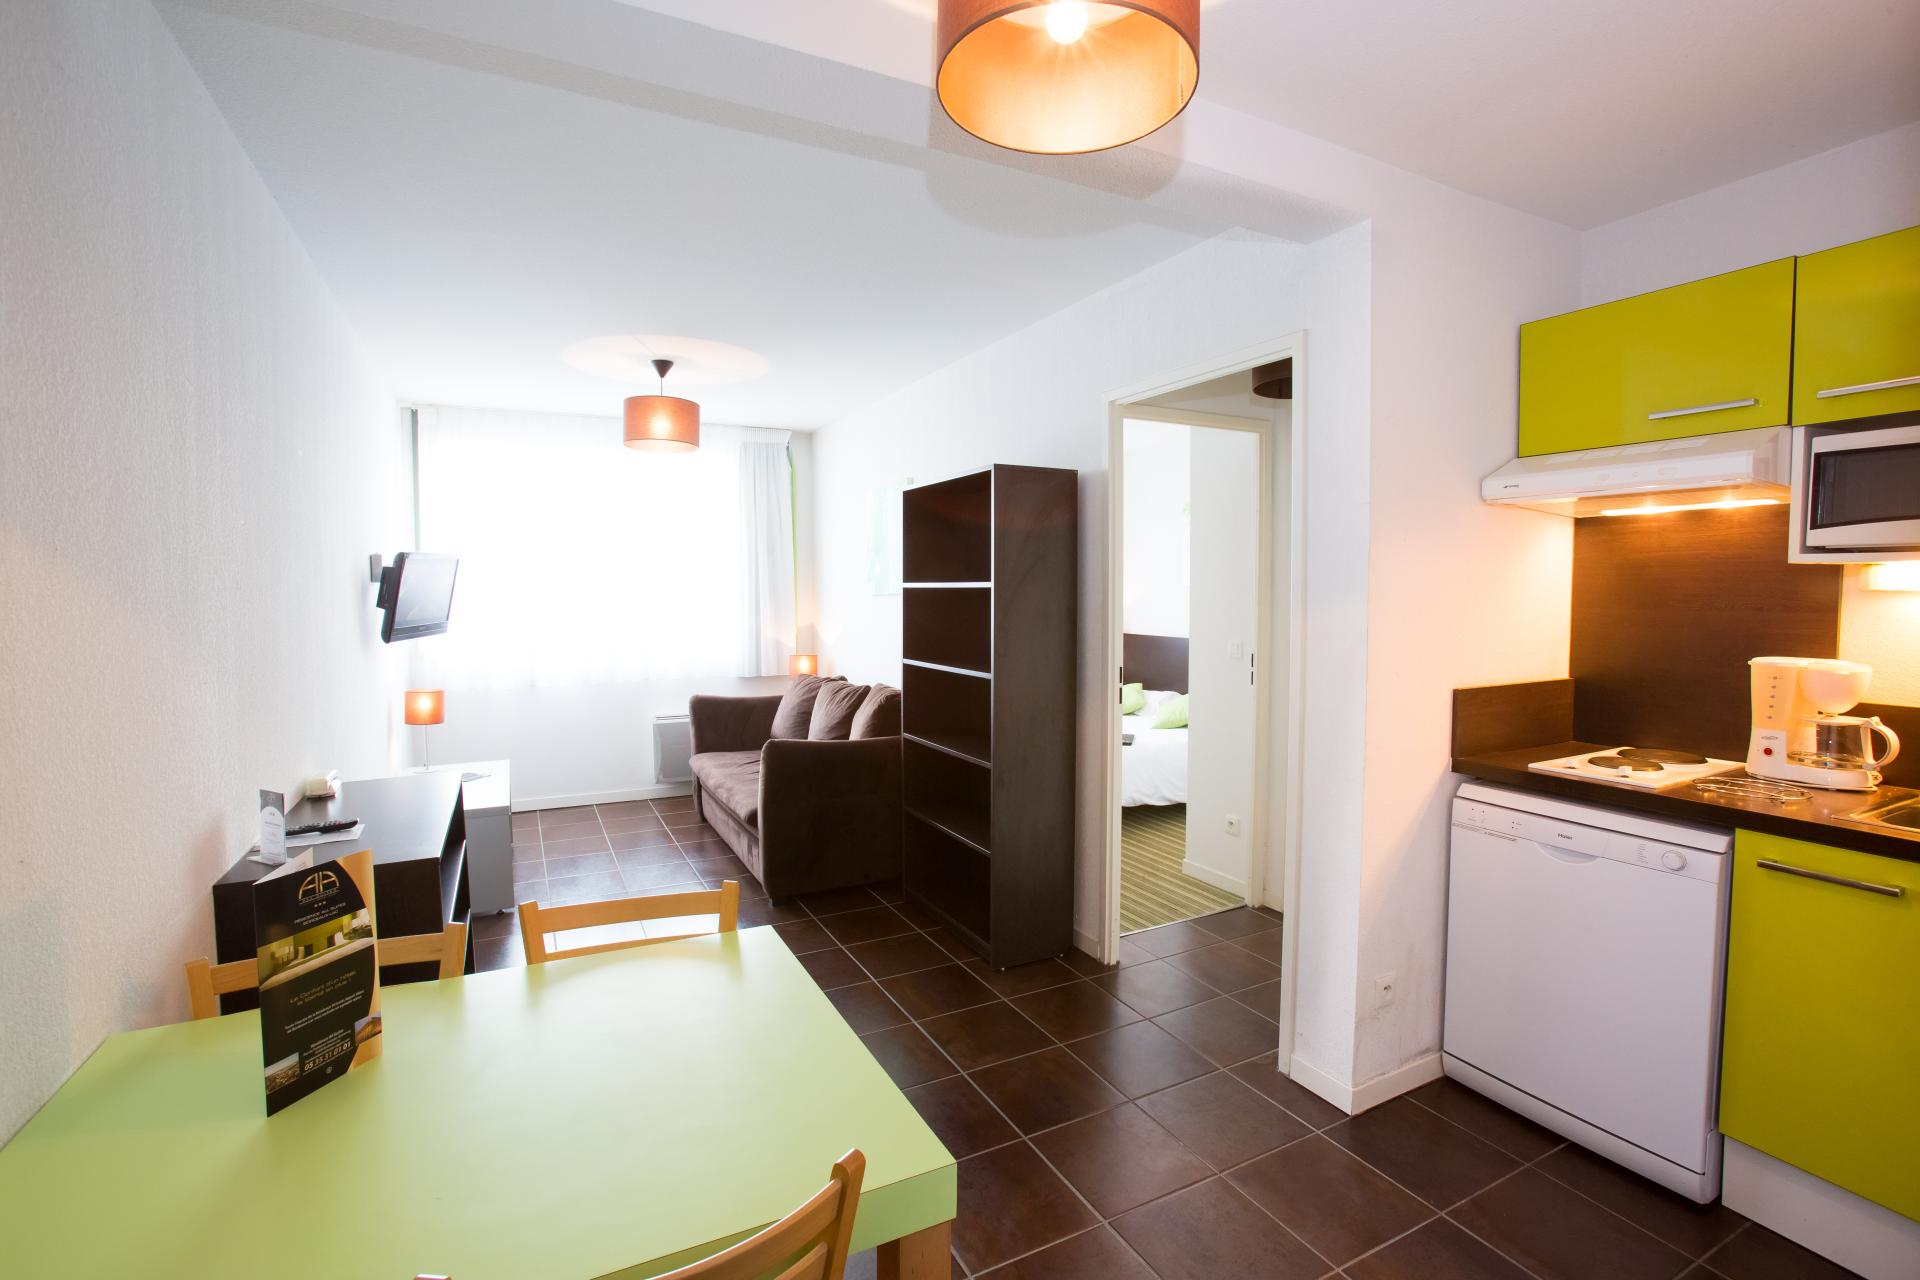 comment vendre son appartement. Black Bedroom Furniture Sets. Home Design Ideas